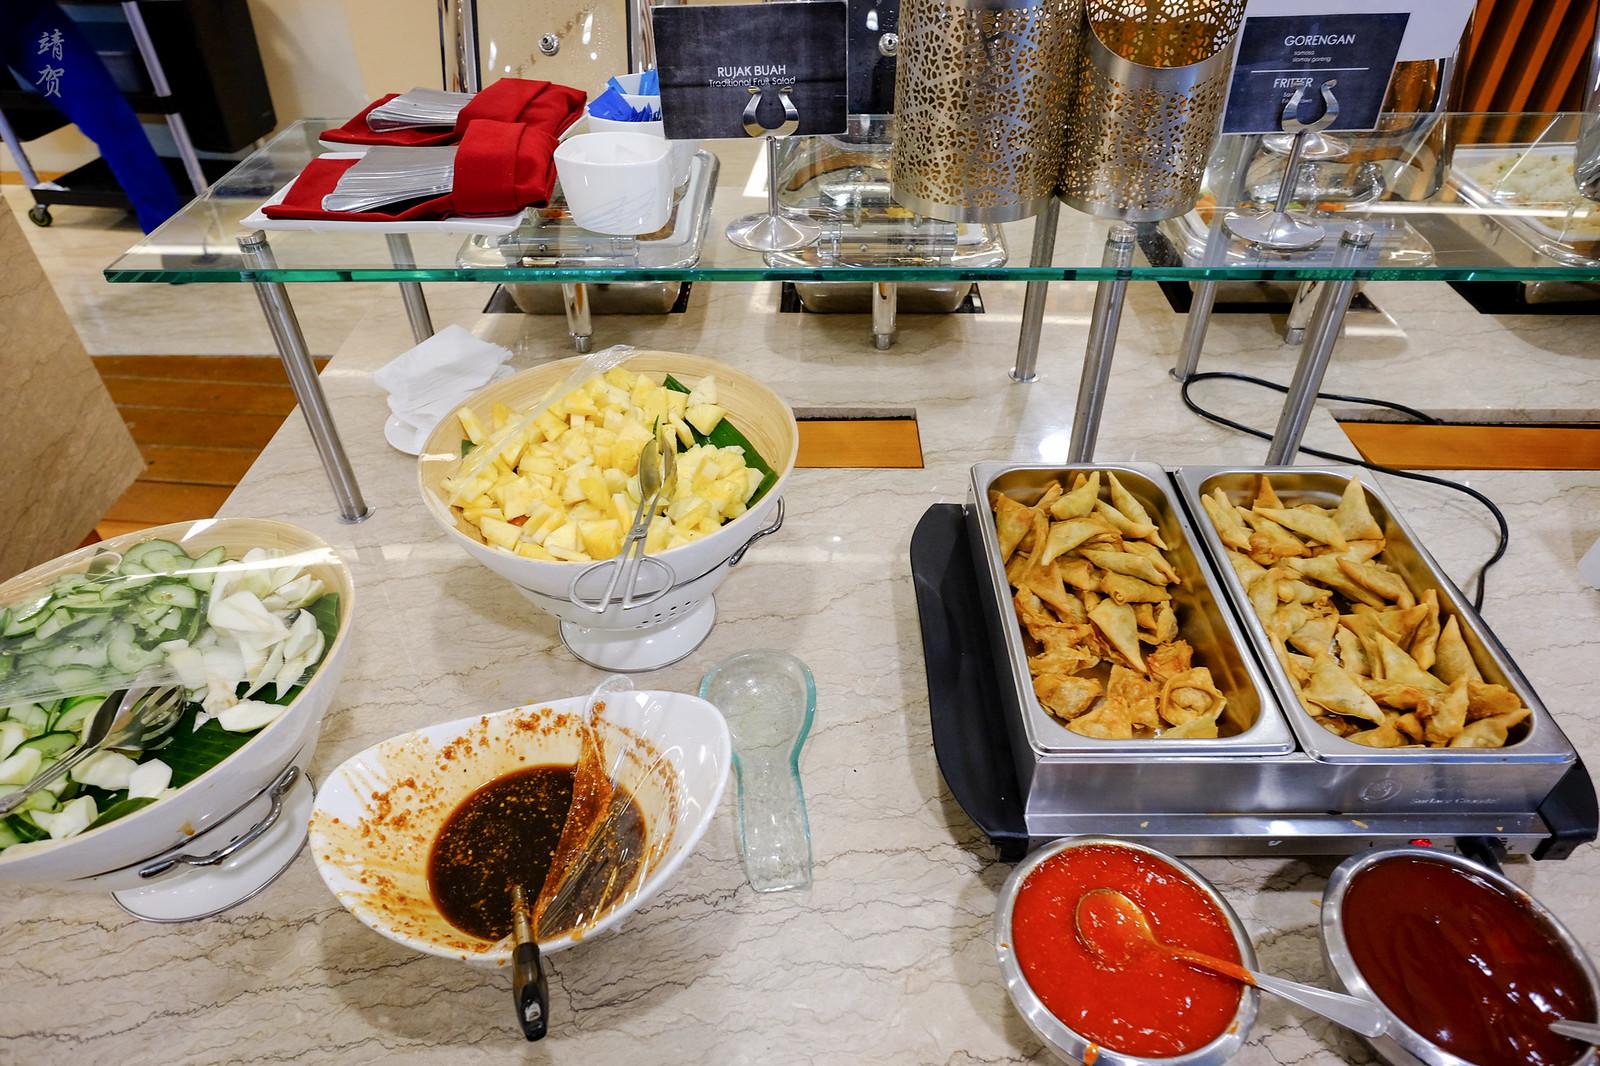 Fried snacks and fruit salad